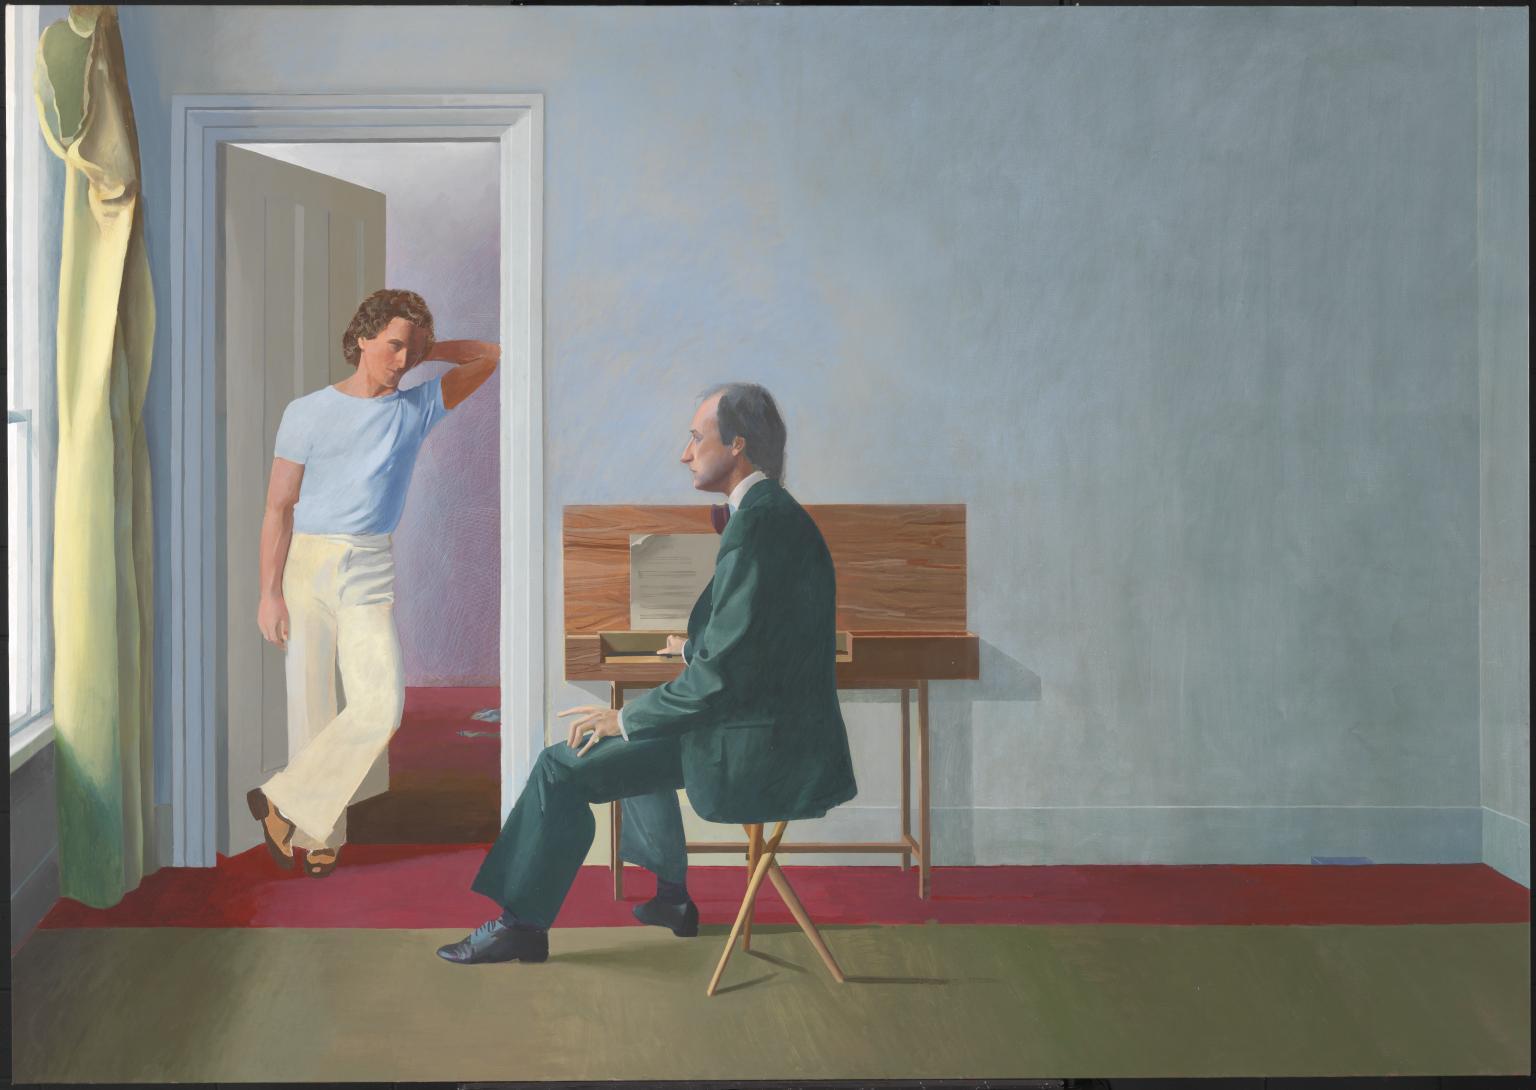 David Hockney, George Lawson and Wayne Sleep, 1972_1975.jpg